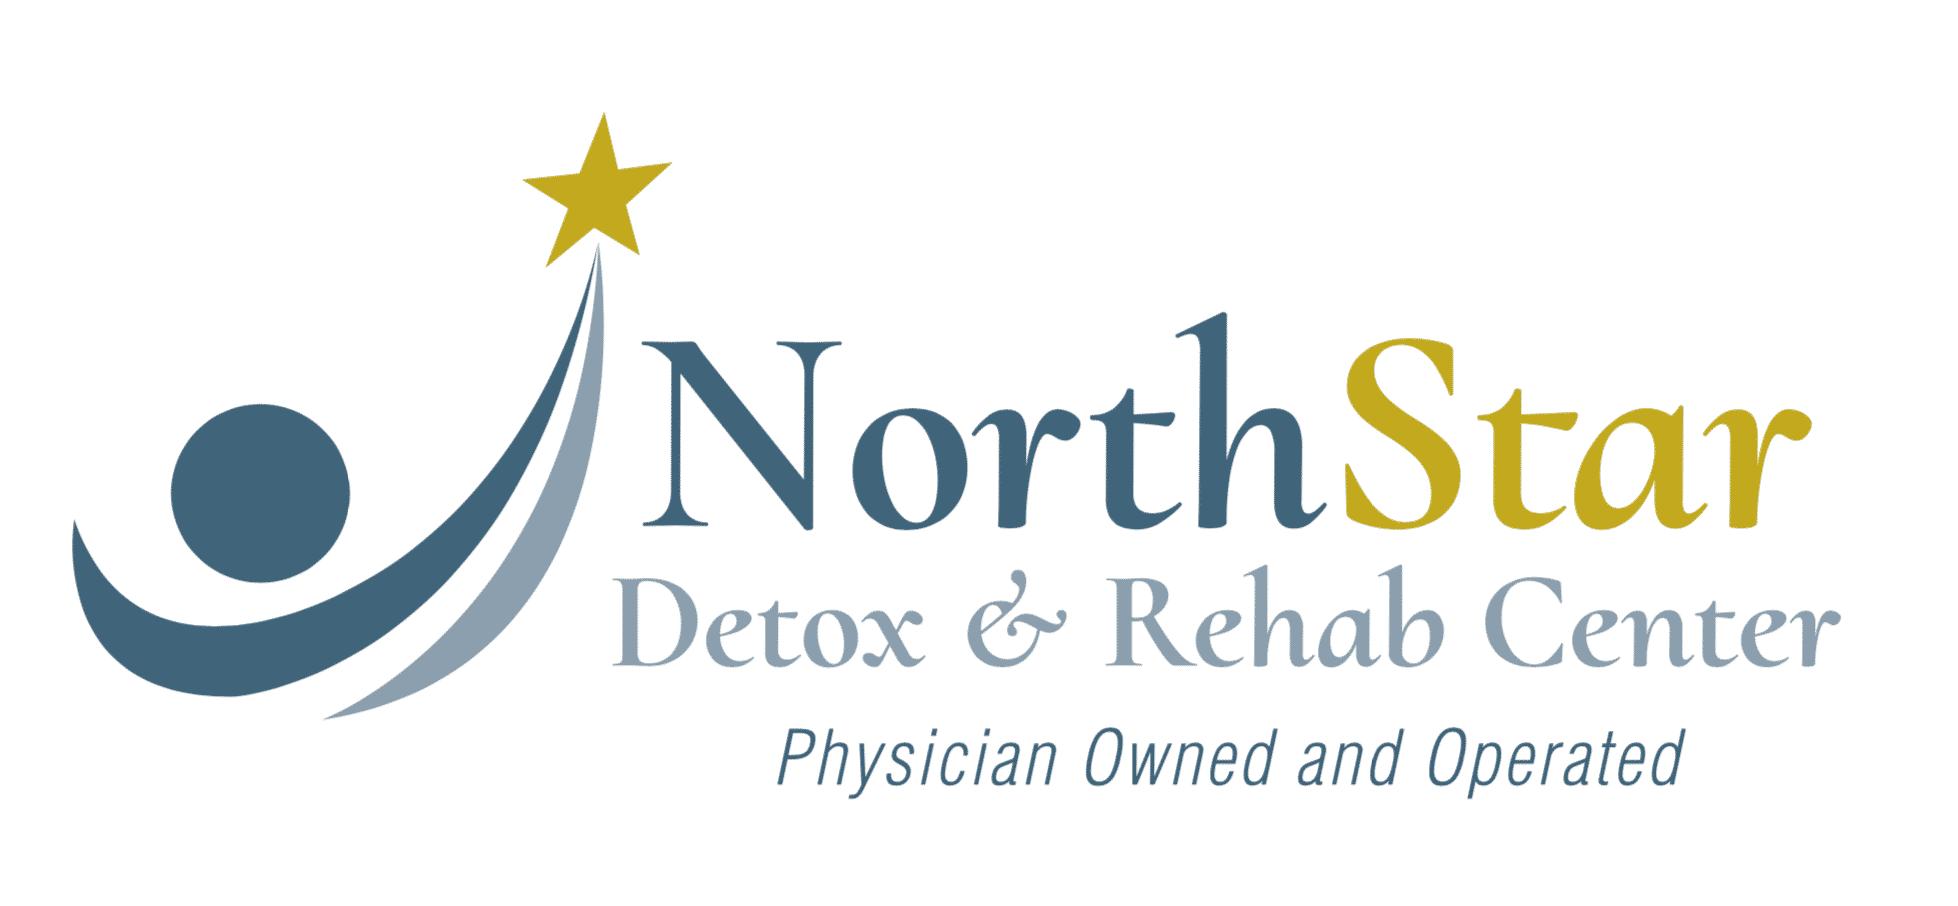 LA detox rehab center